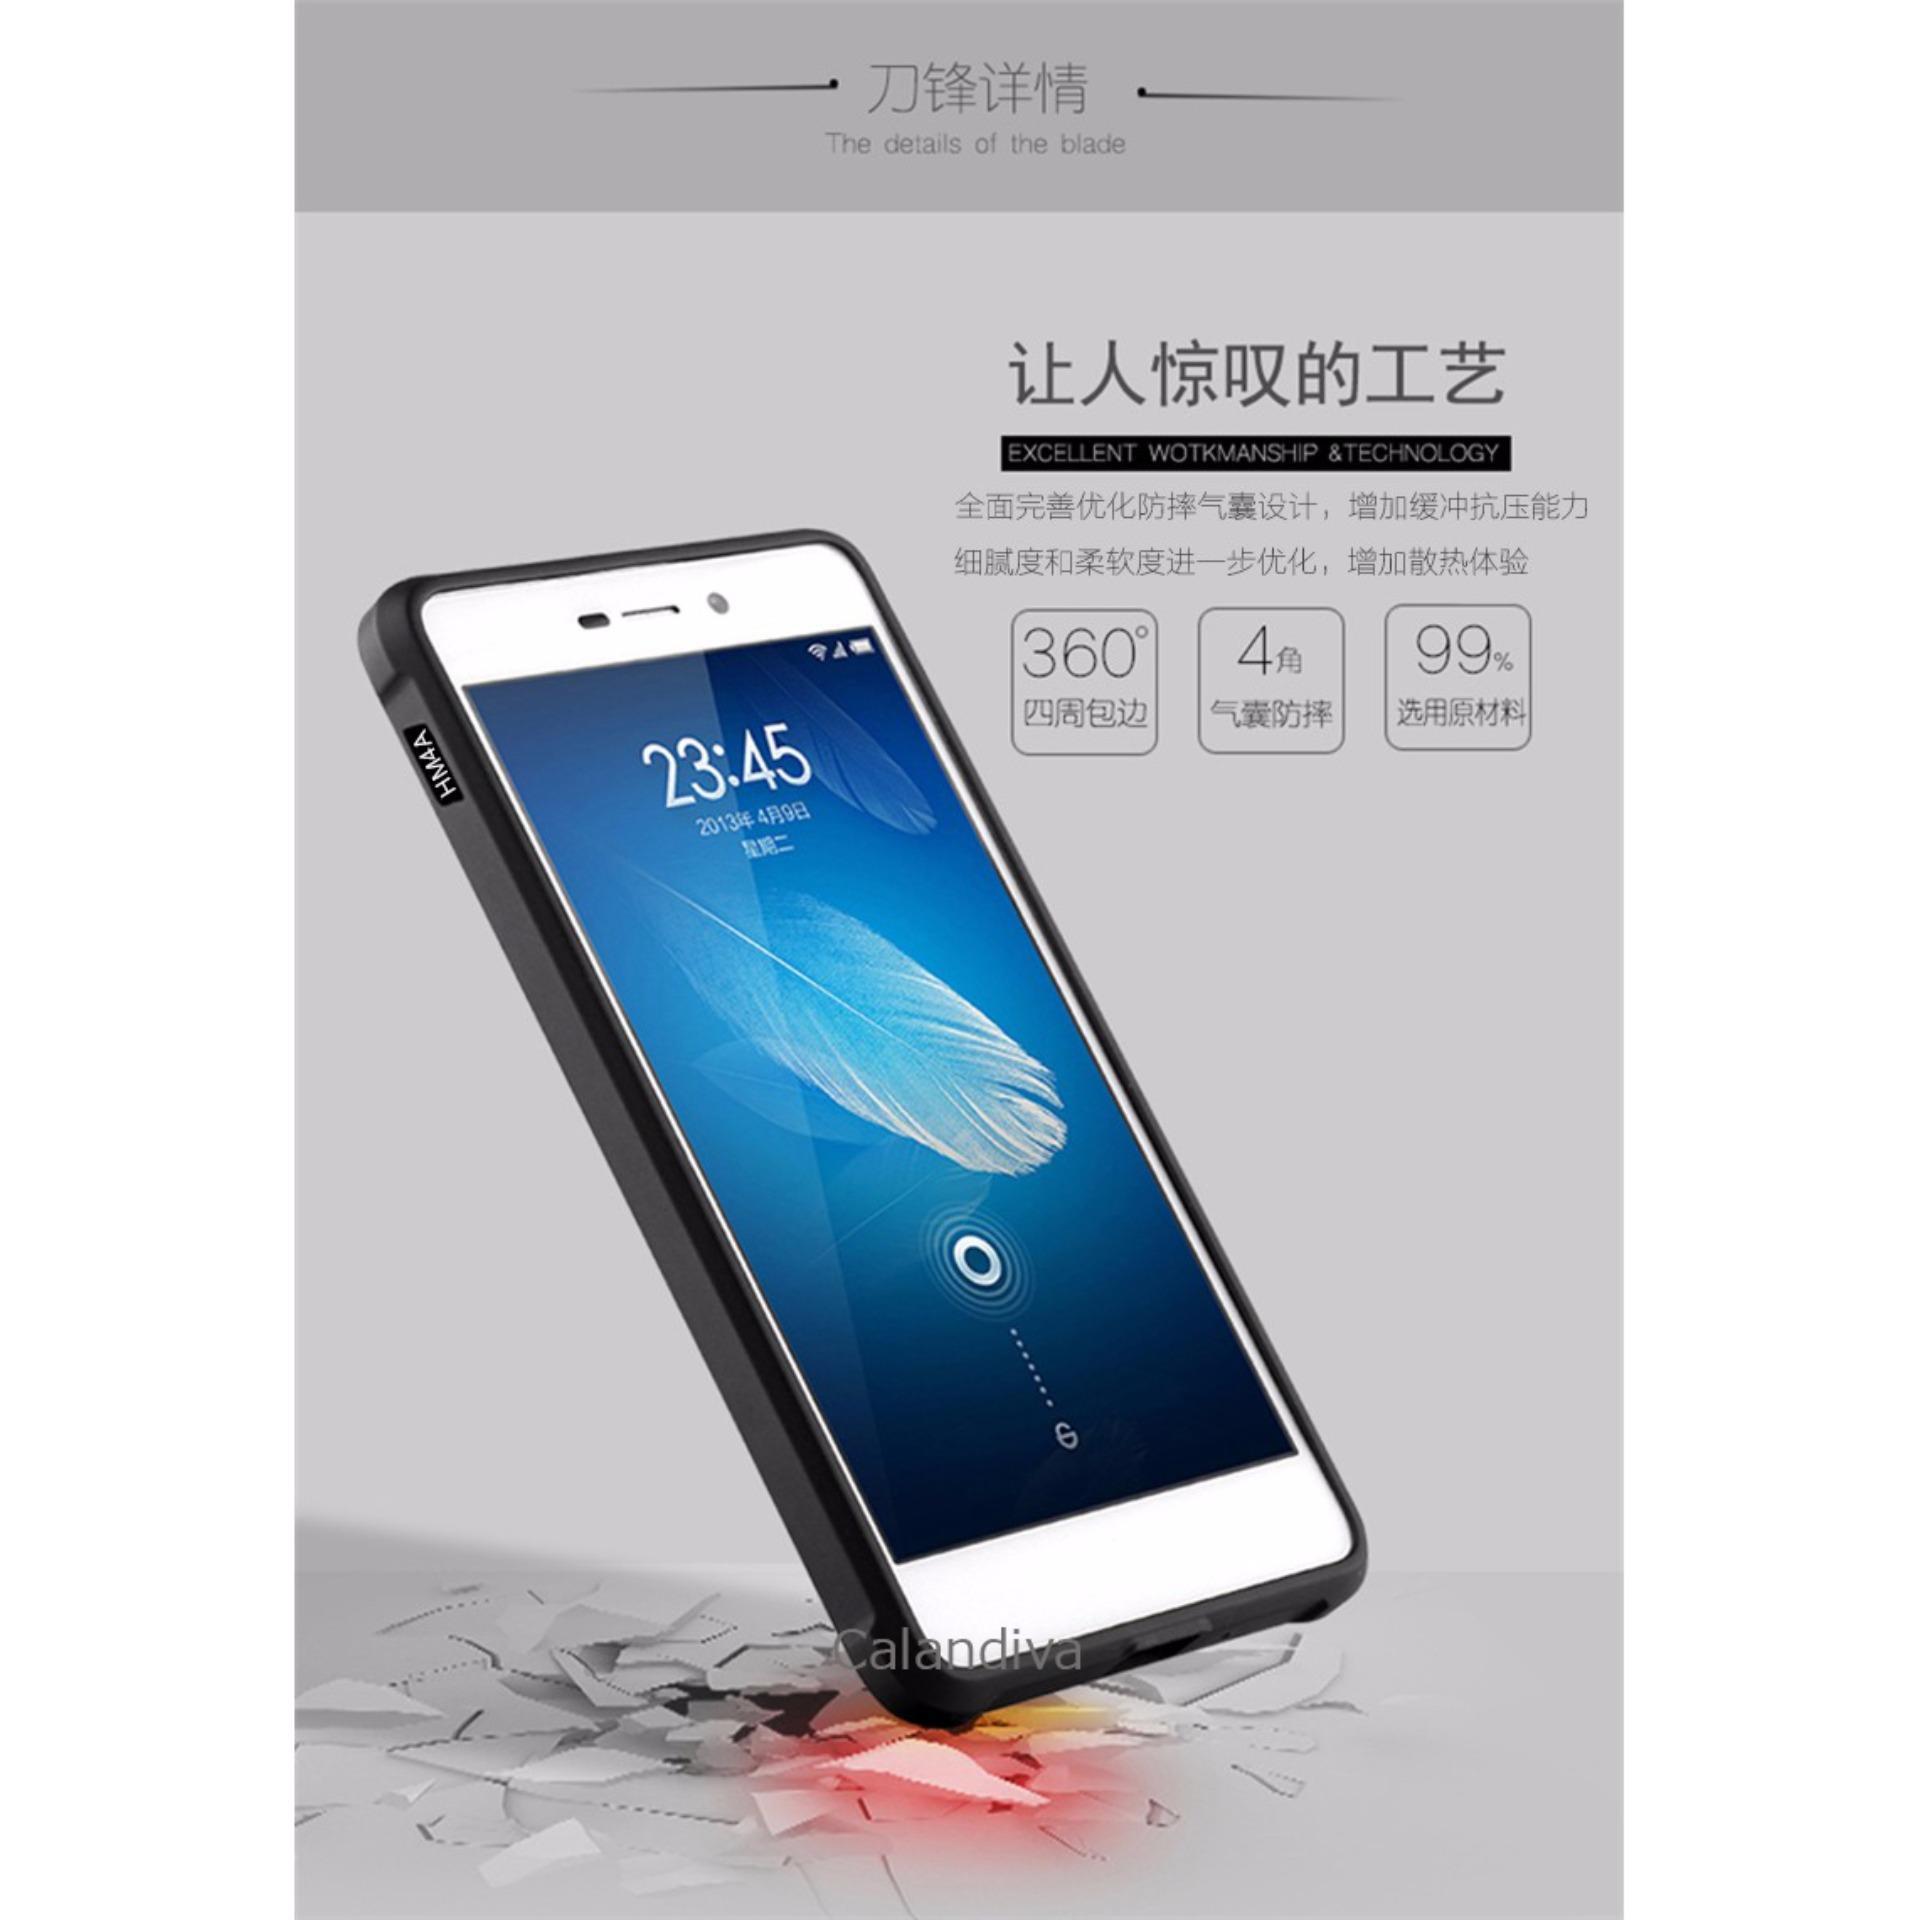 Calandiva Dragon Shockproof Hybrid Case for Xiaomi Redmi 4A / Redmi 4A Prime .